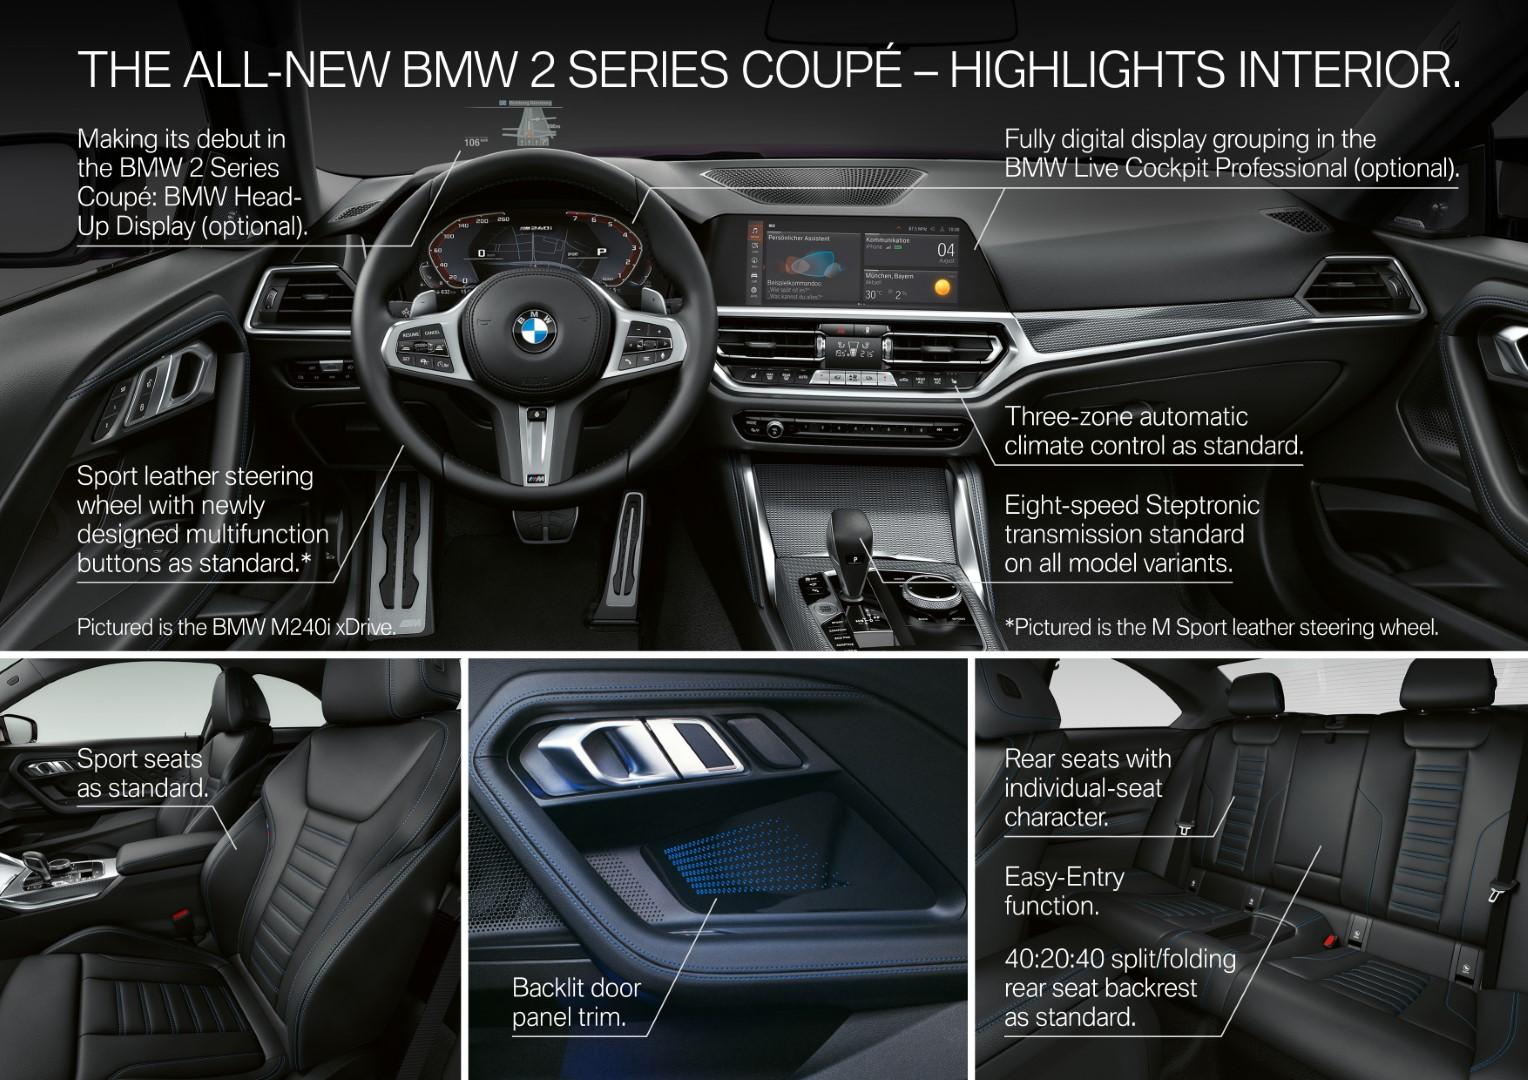 BMW 2 Series Coupe interior